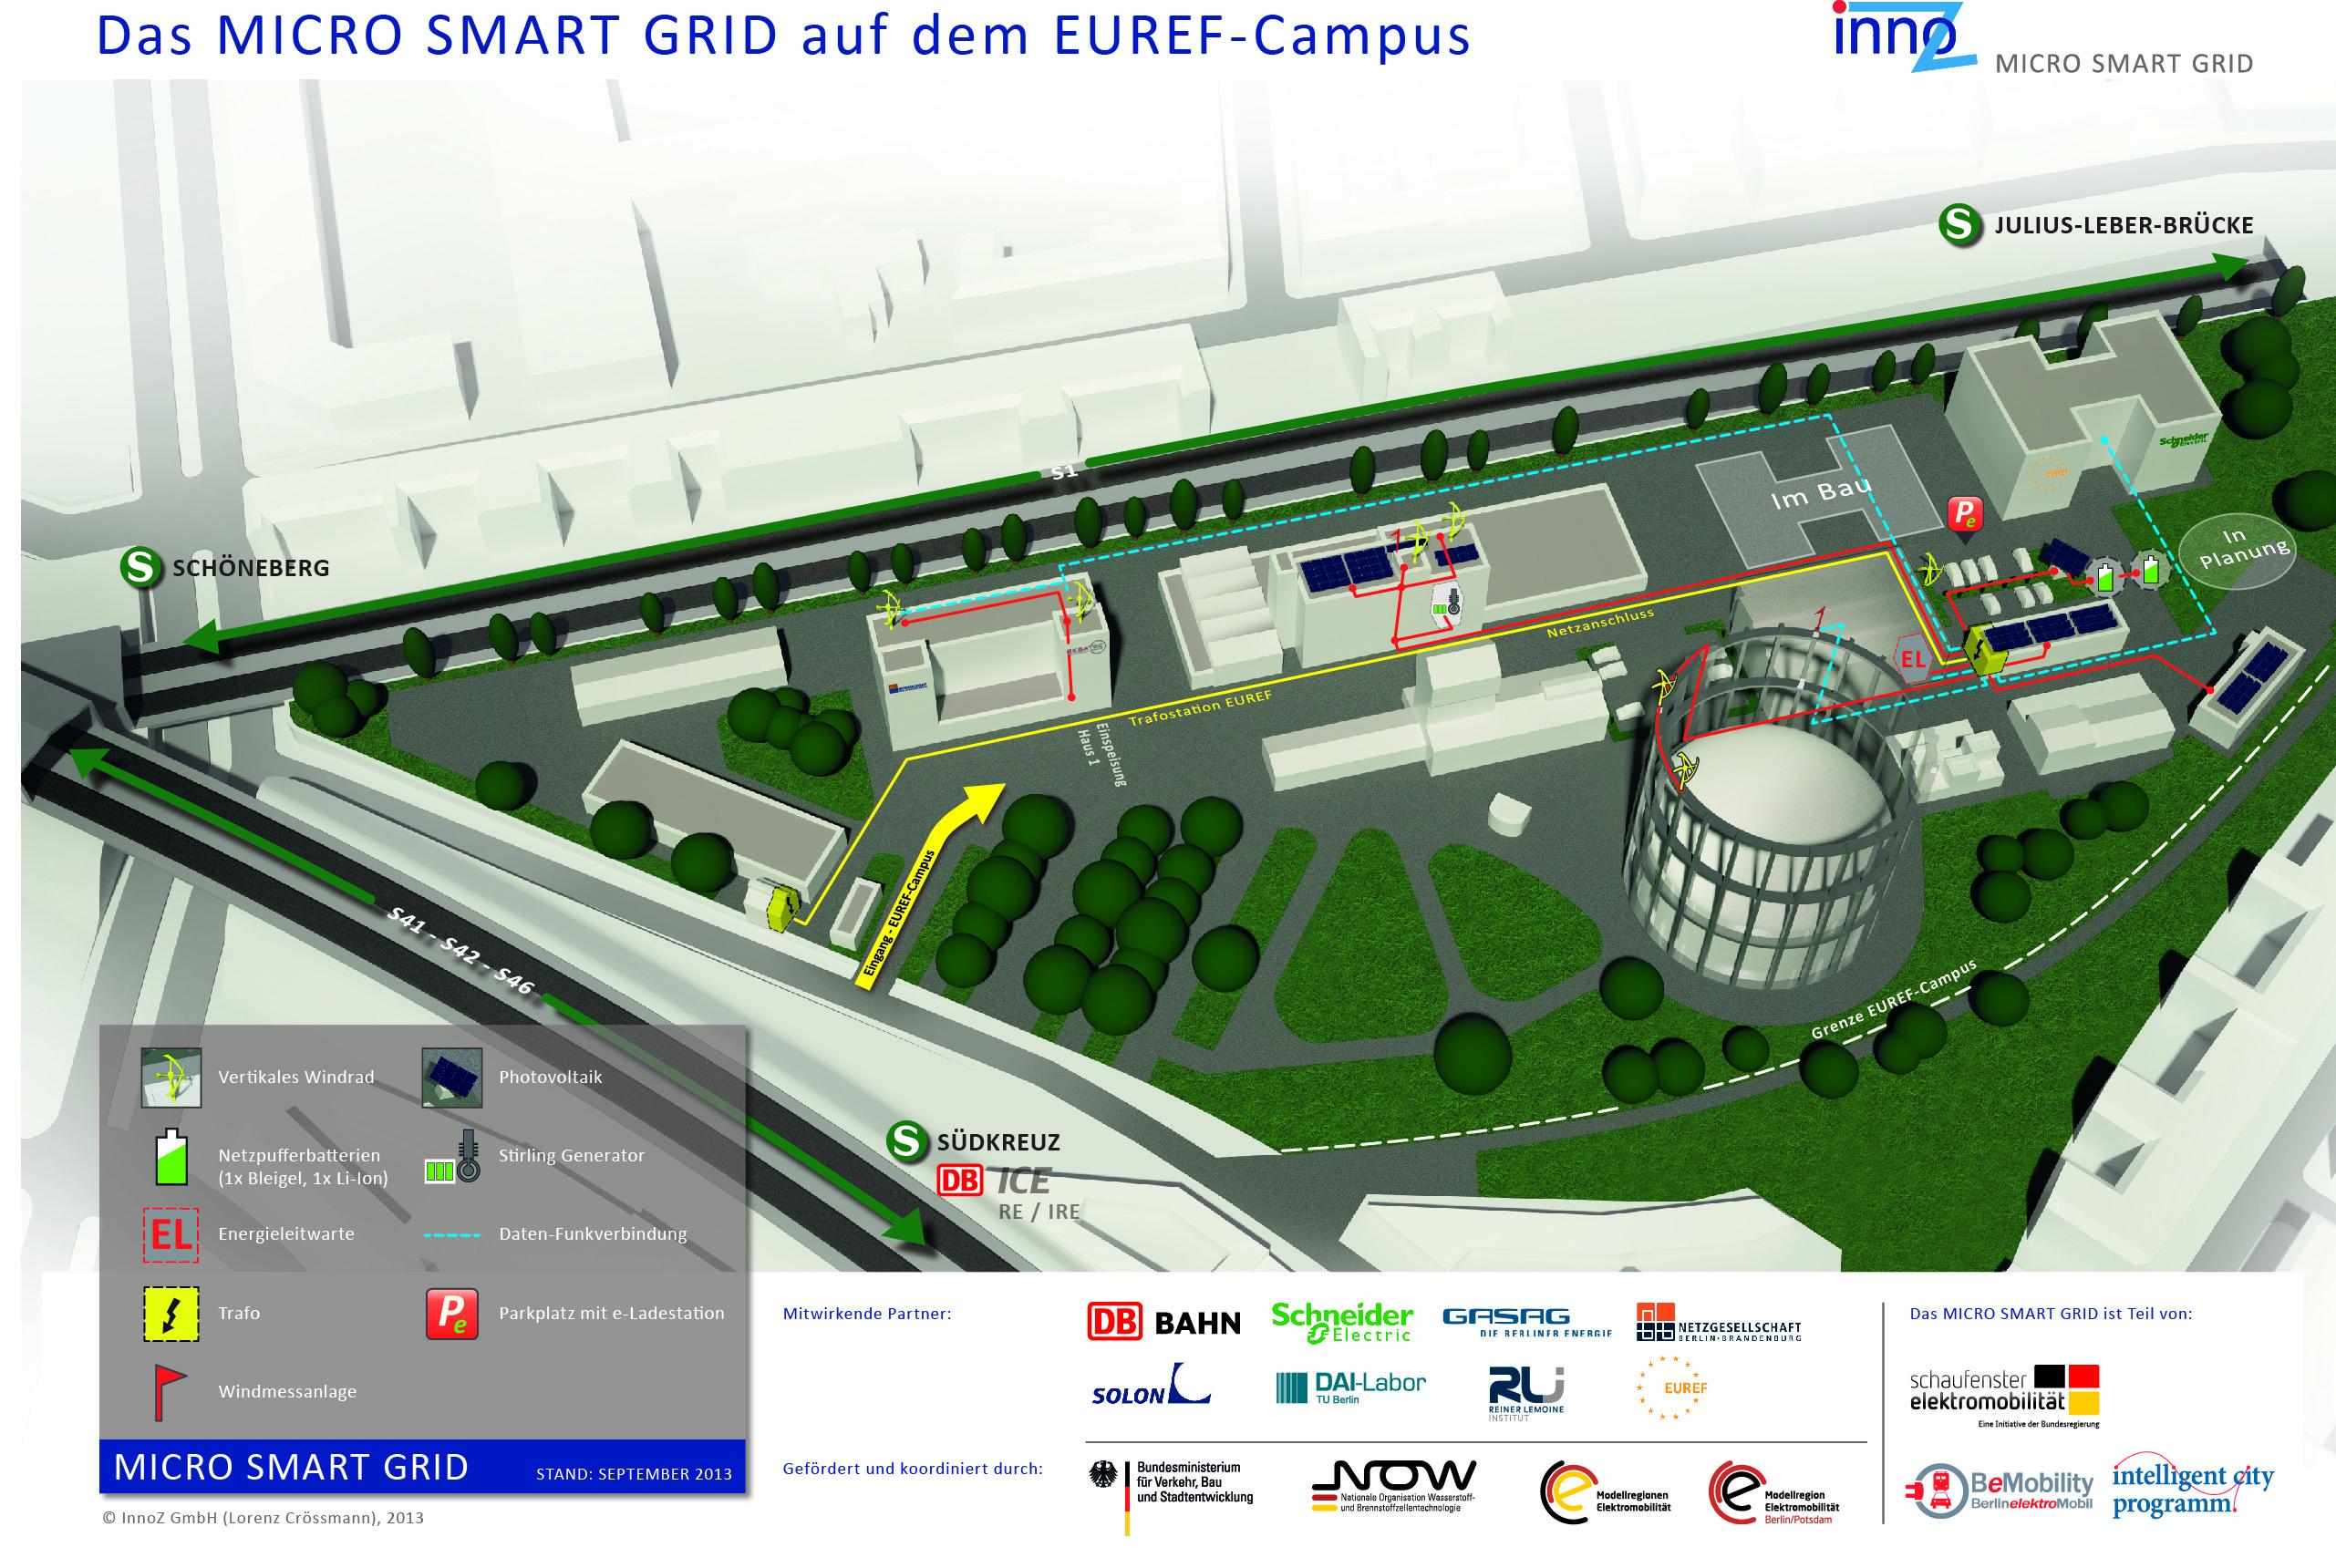 Lageplan Micro Smart Grid